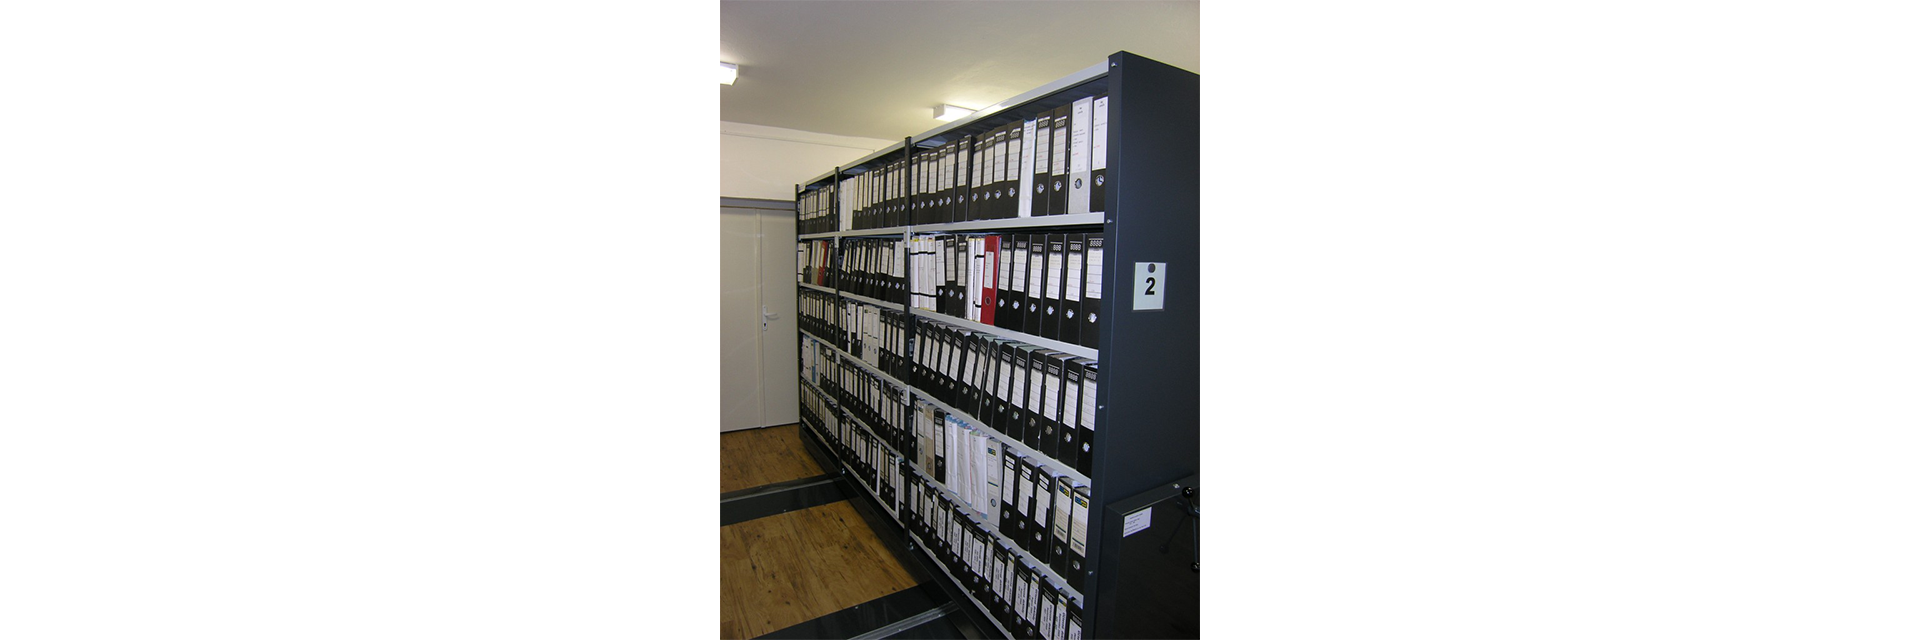 Posúvné Regály – archívy